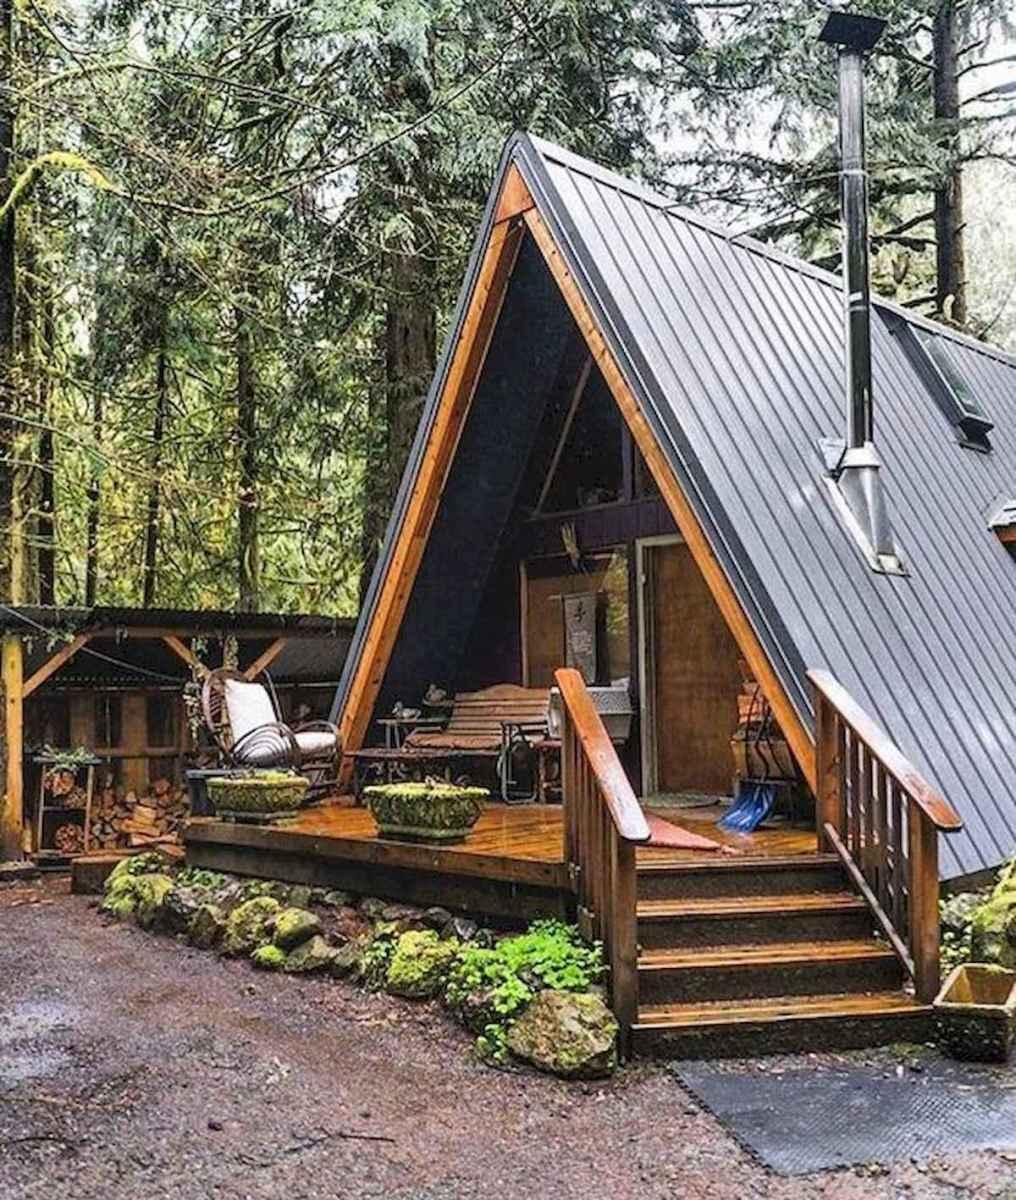 70 Suprising Small Log Cabin Homes Design Ideas (21)